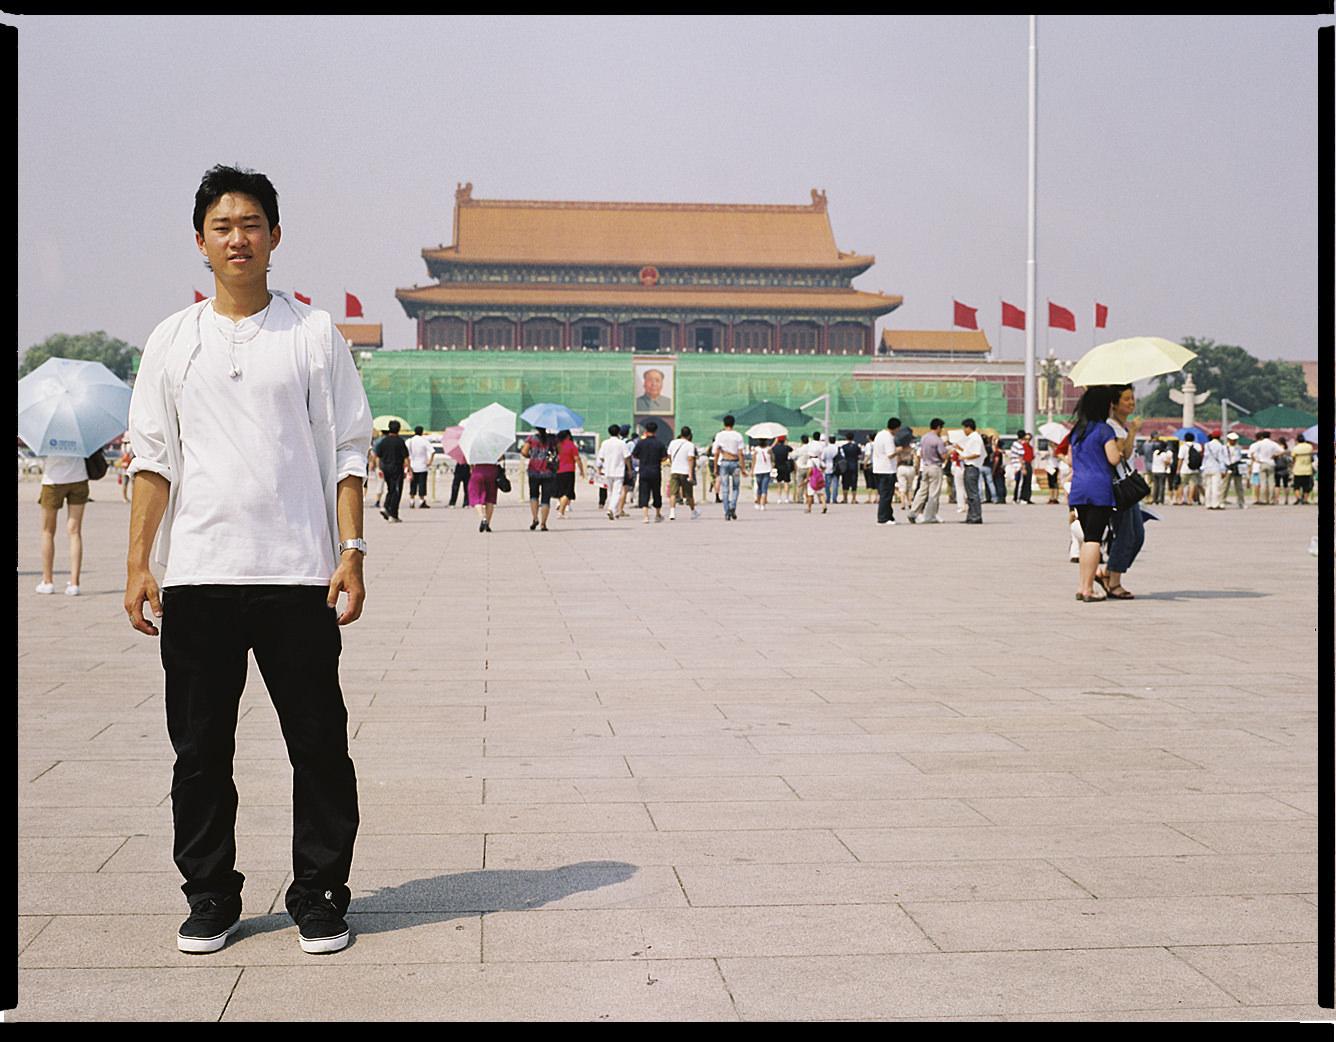 MediumFormatPatrikWallner_Beijing_DannySquareLOWQ